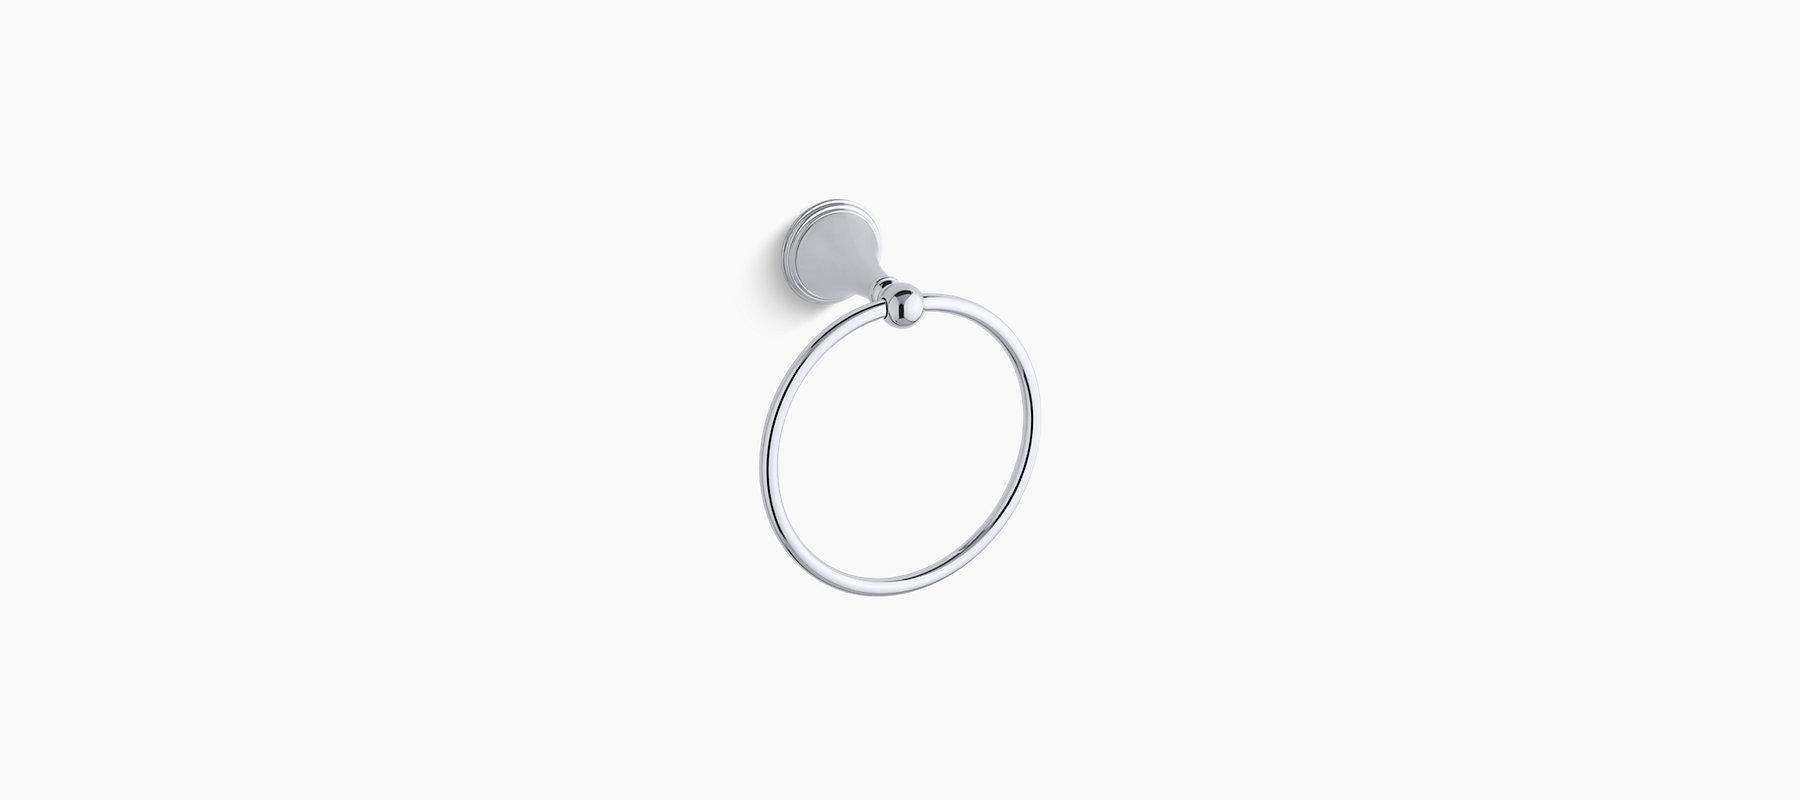 K 363 Finial Traditional Towel Ring Kohler